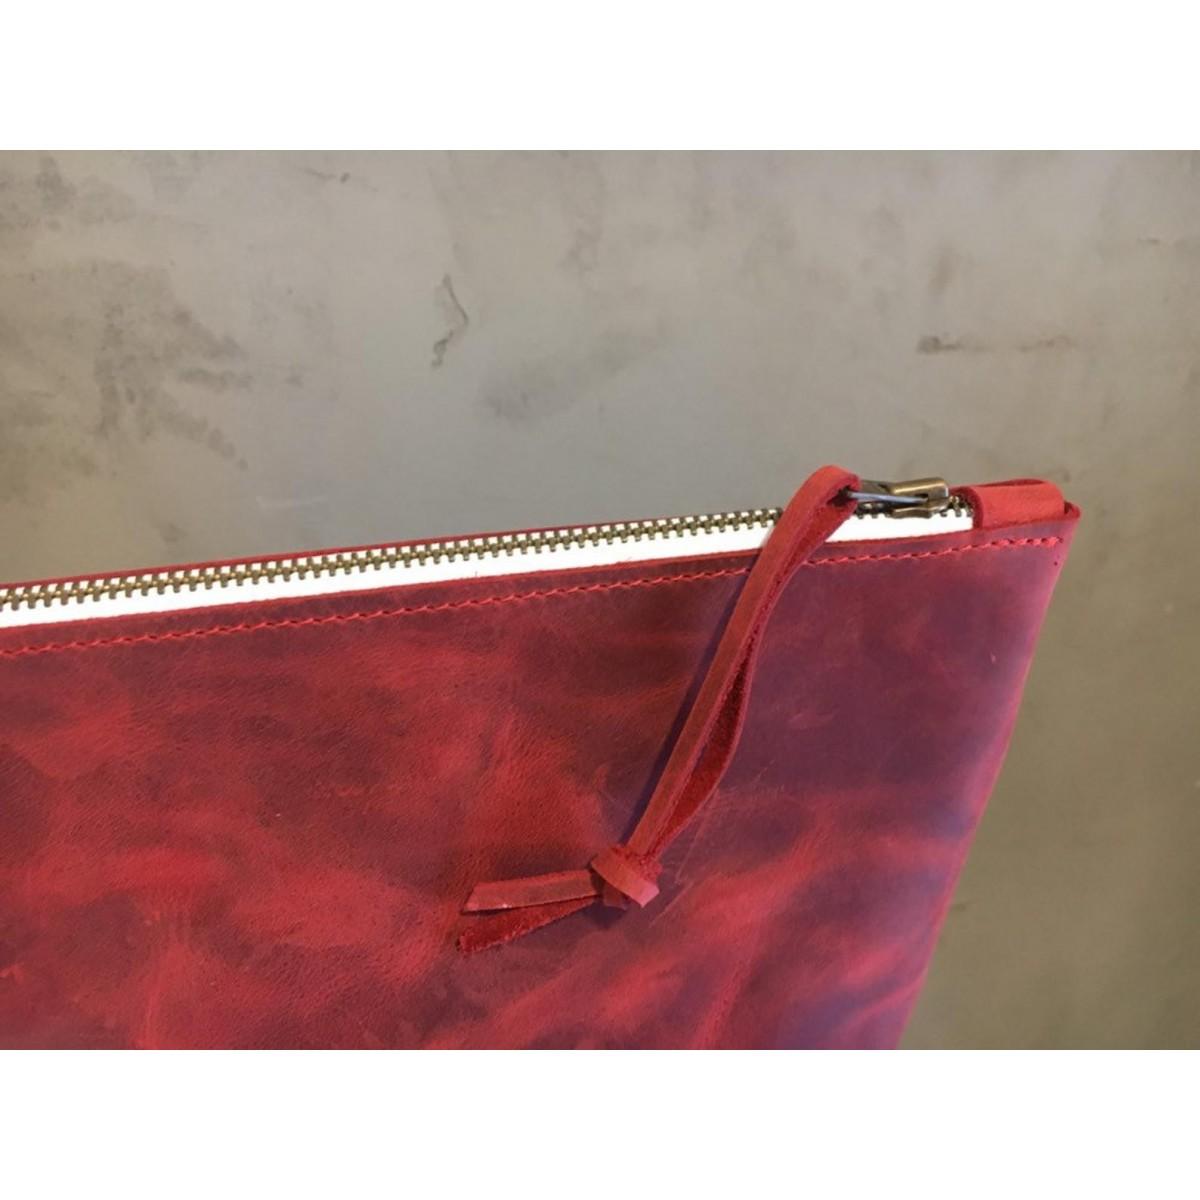 BSaite / Echtleder Kosmetik Tasche / Leather cosmetic bag / Etui aus rotem Leder